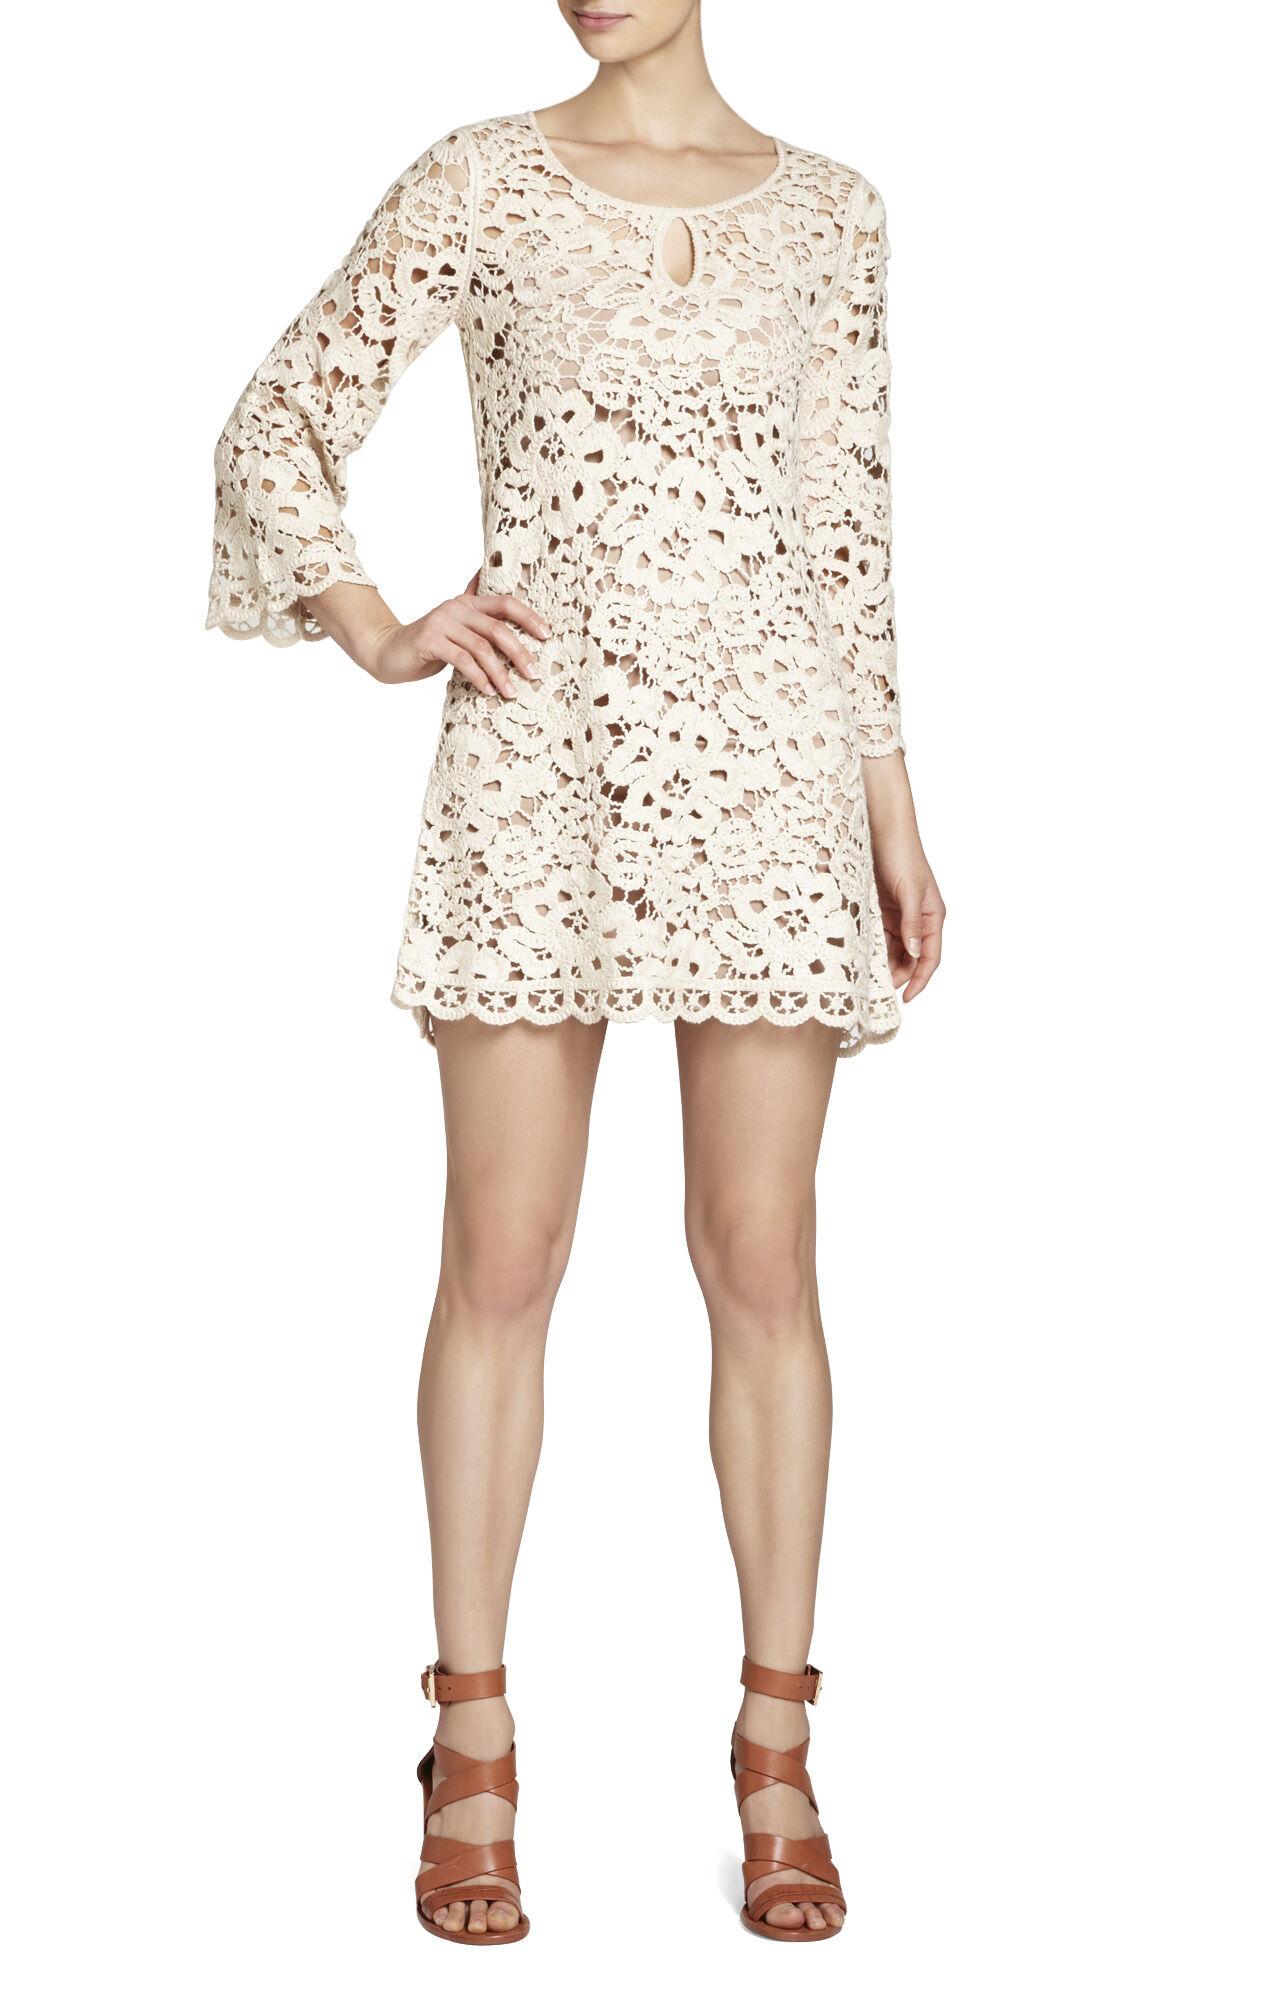 Tianya Crochet Tunic Dress